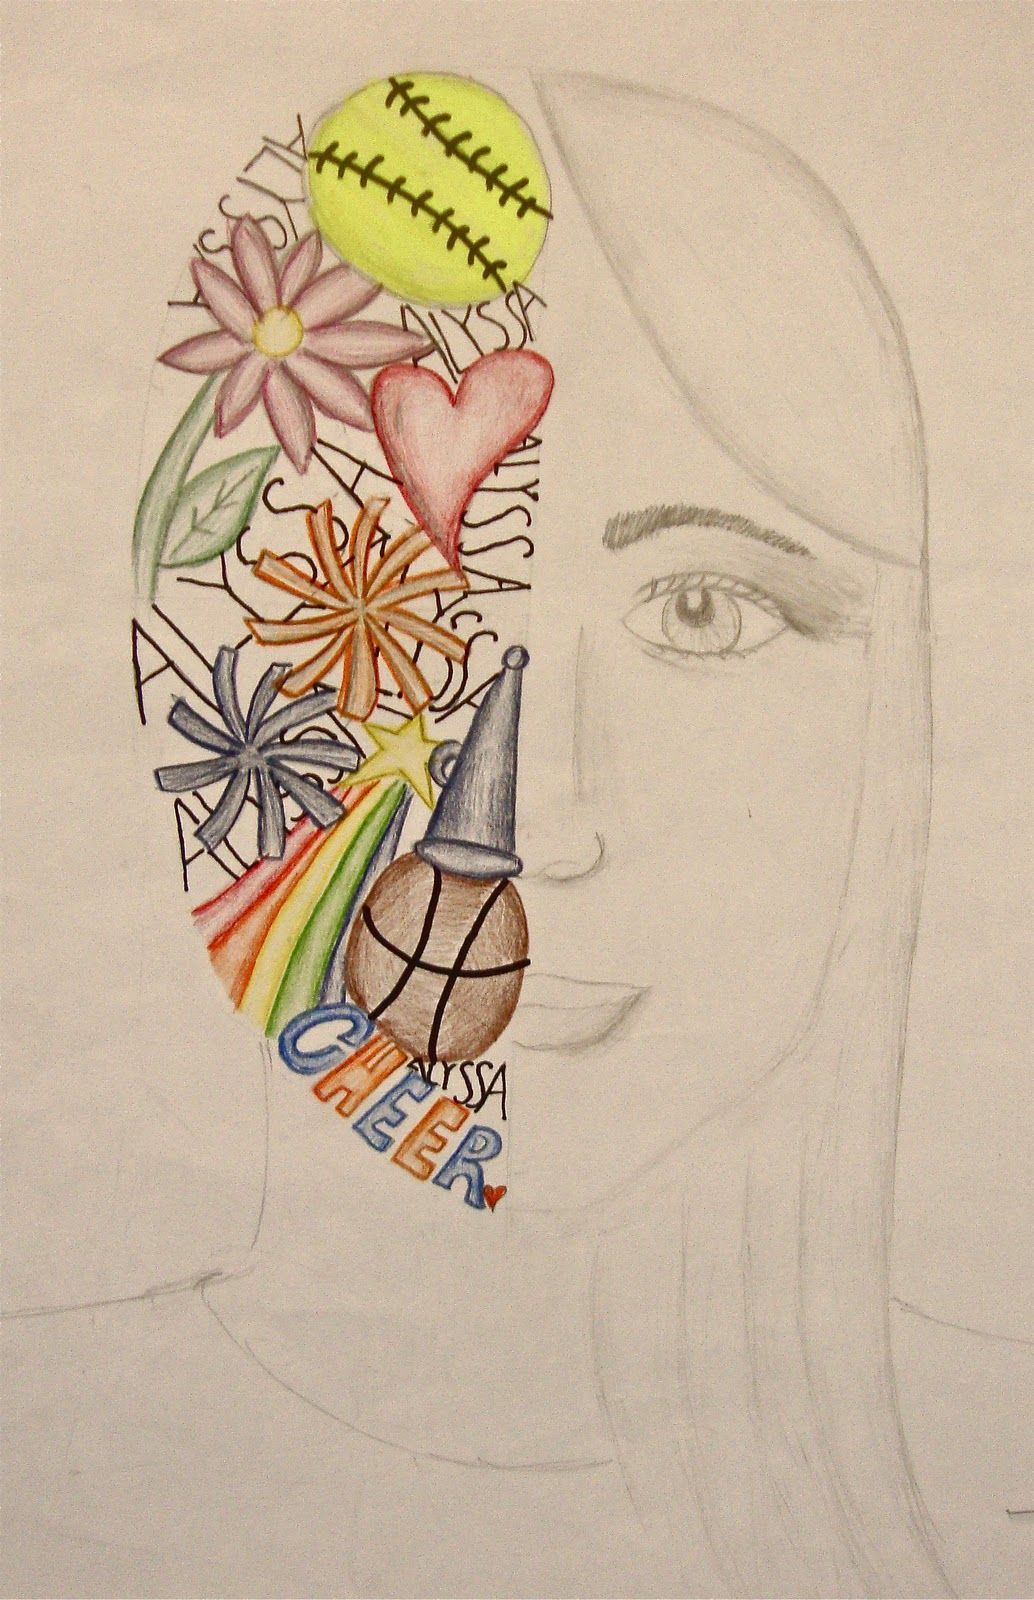 Art Paper Scissors Glue Split Face Self Portrait